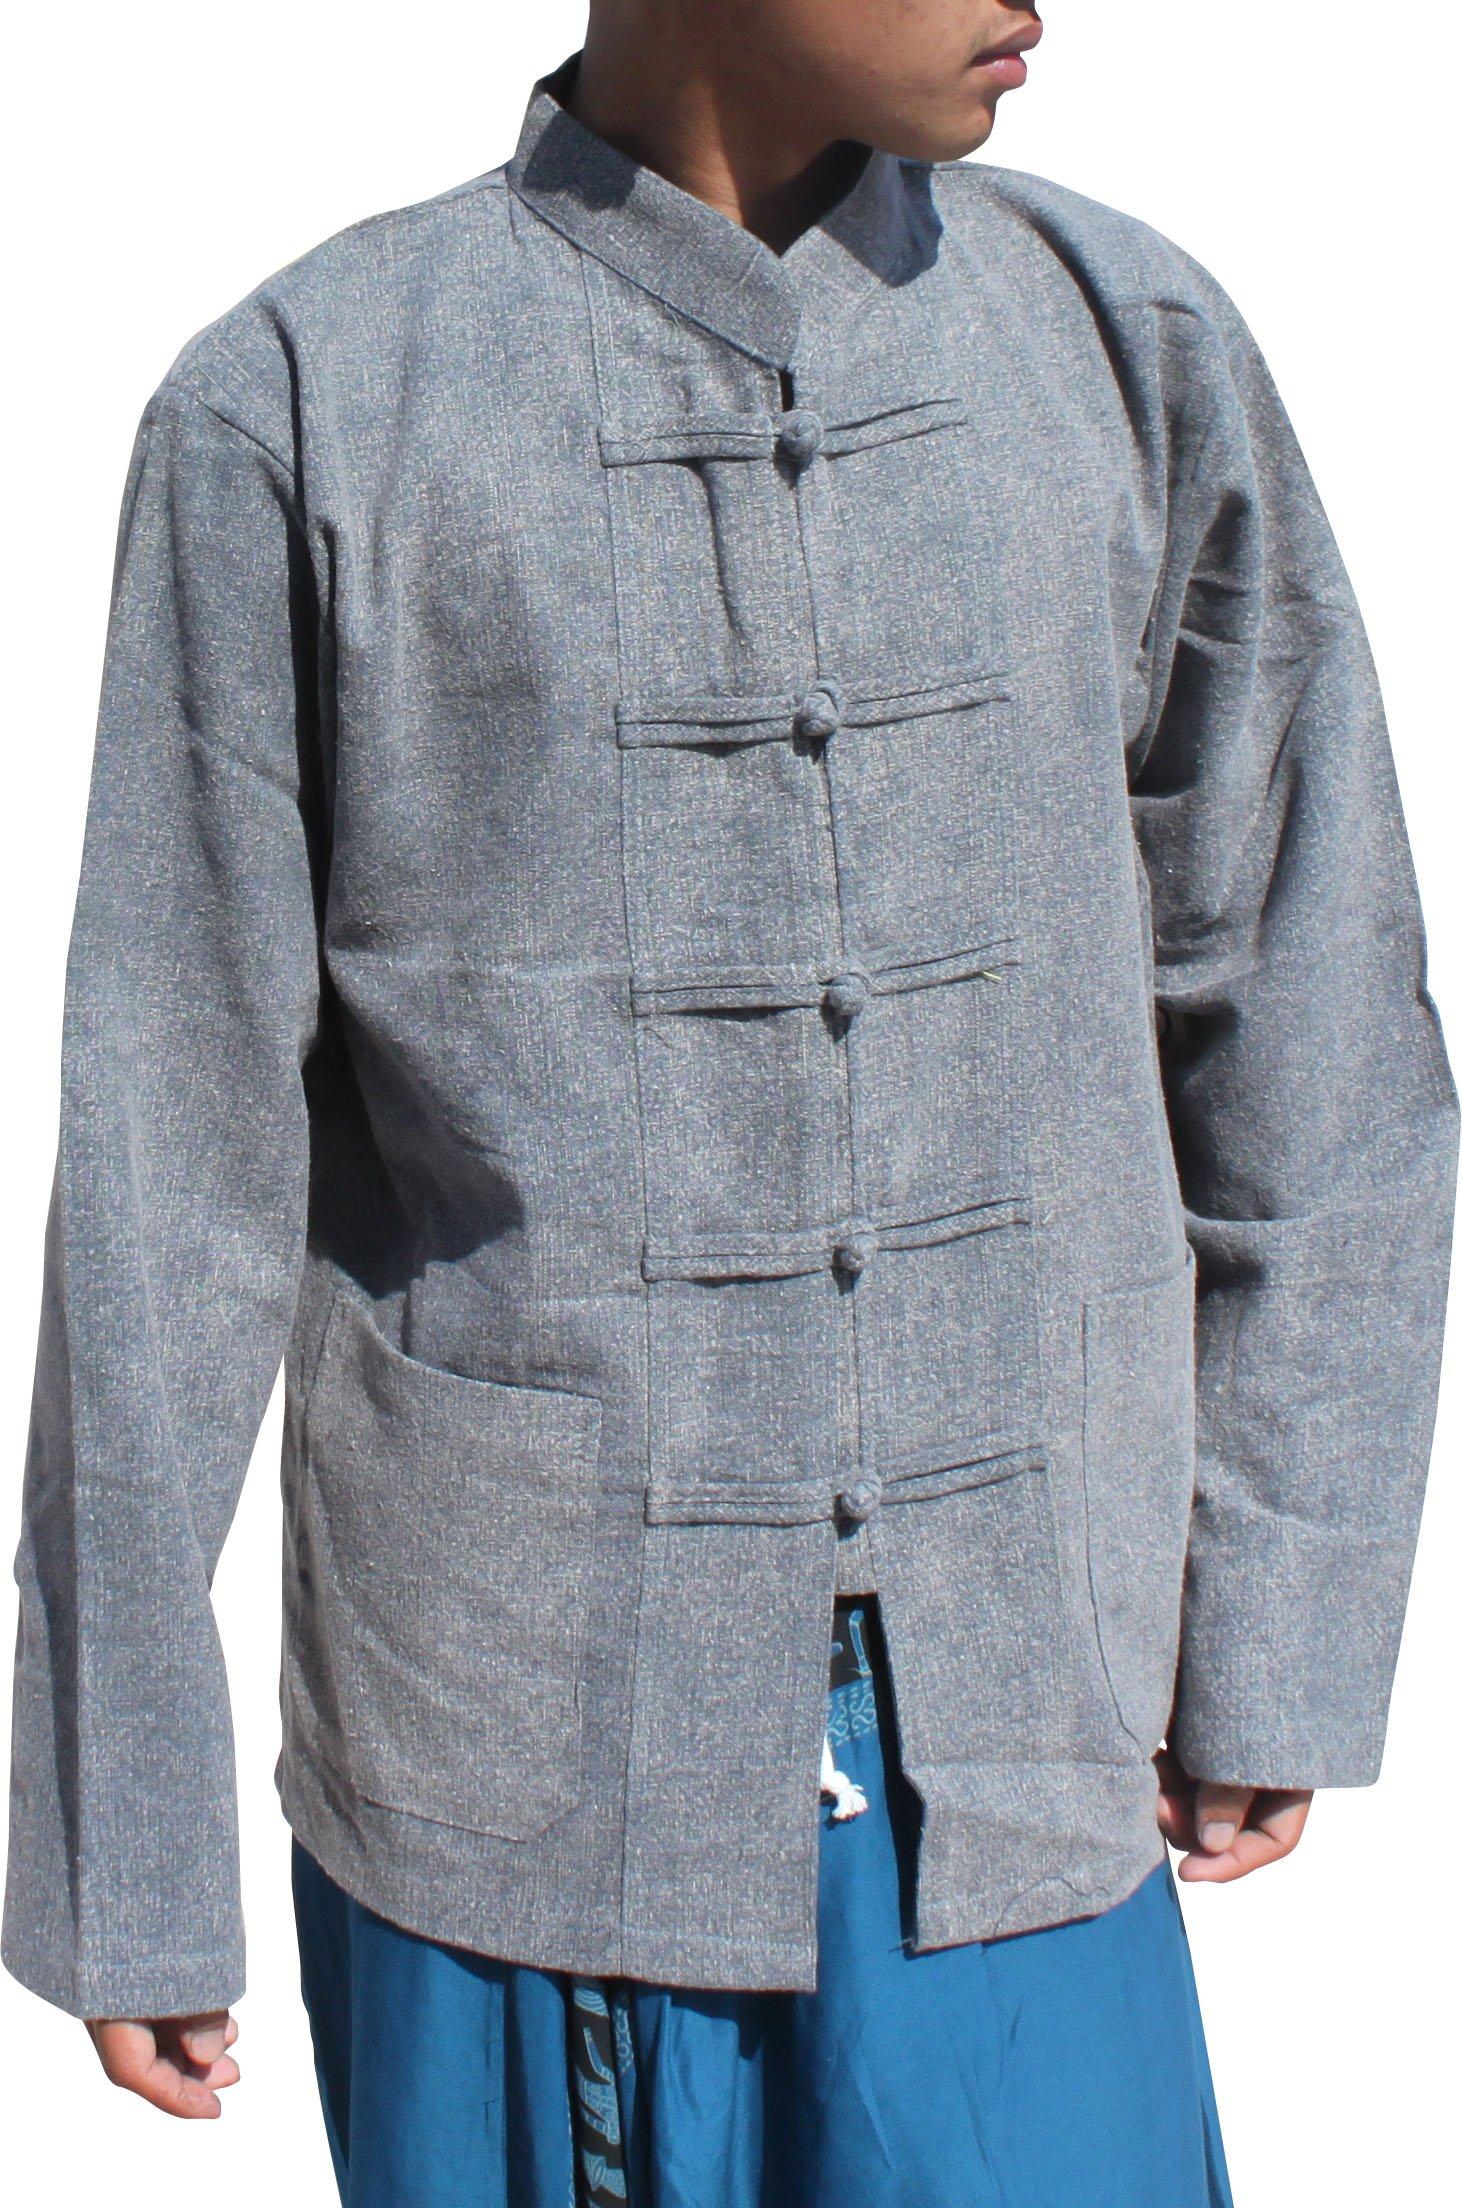 Raan Pah Muang Stonewash Medieval Cotton Shirt Chinese Jacket Collar Long Sleeve Plus, XX-Large, Gray by Raan Pah Muang (Image #1)